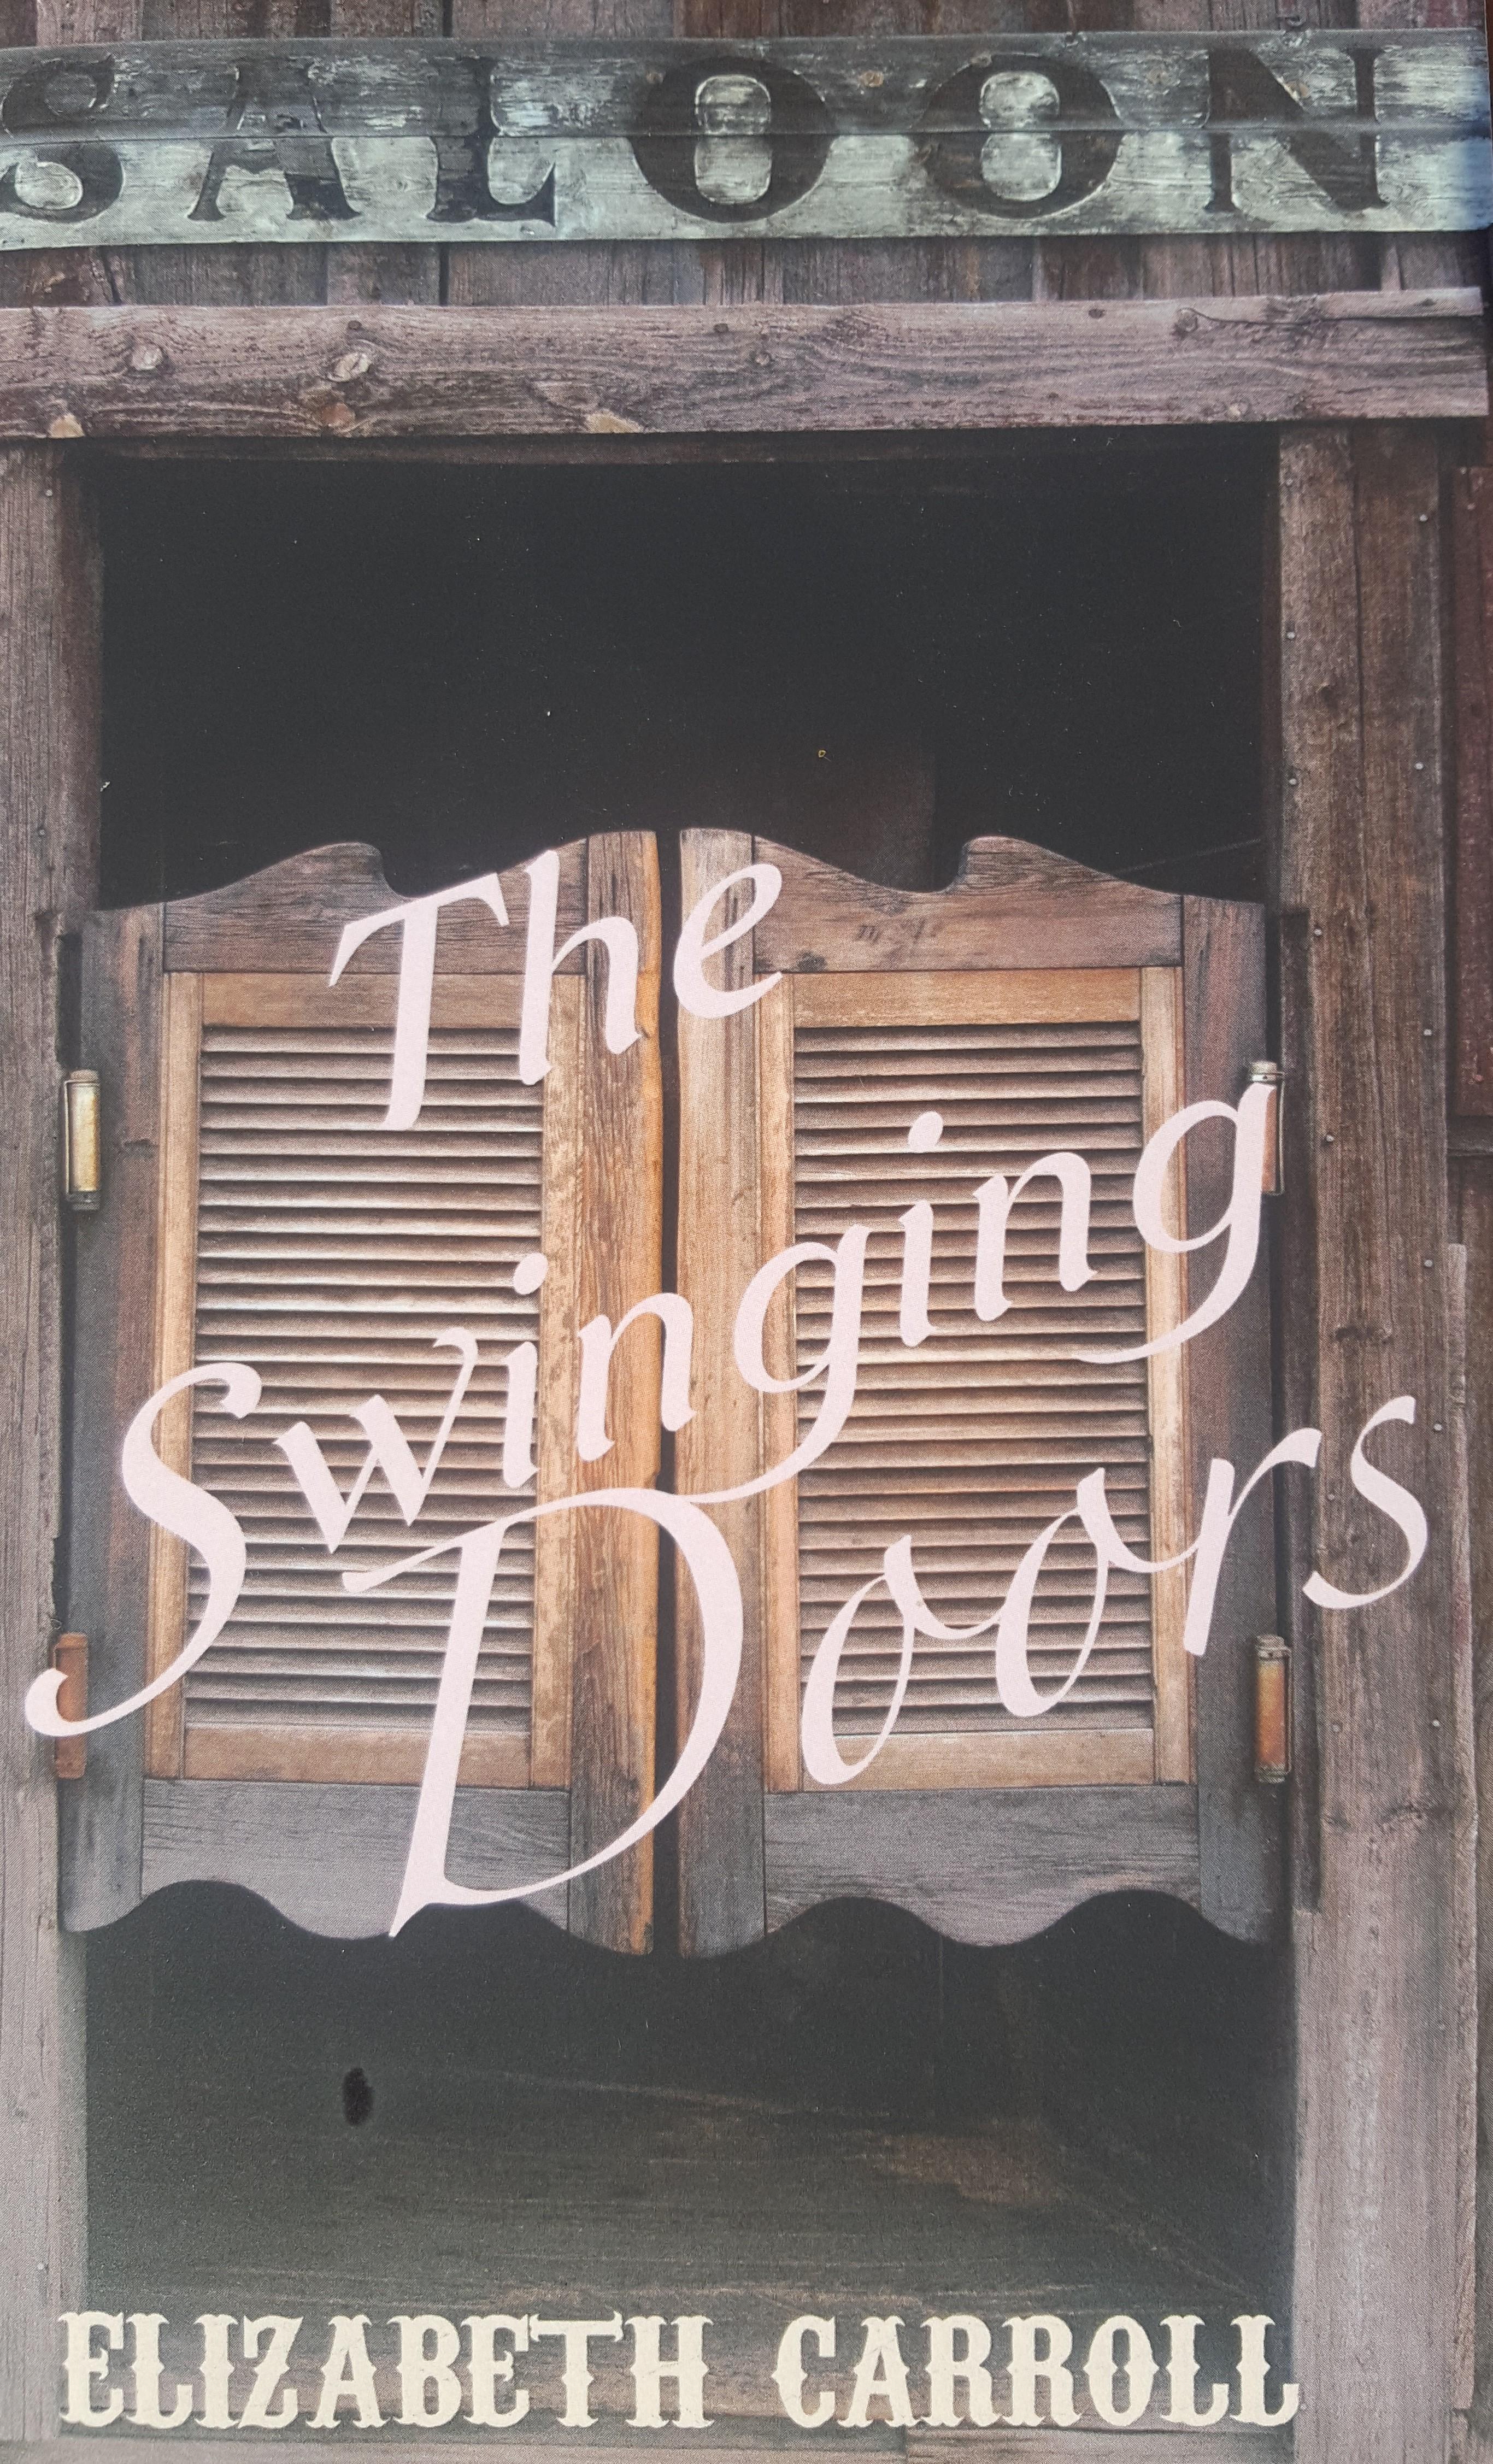 Elizabeth Carroll Realizes Her Dream - The Swinging Doors